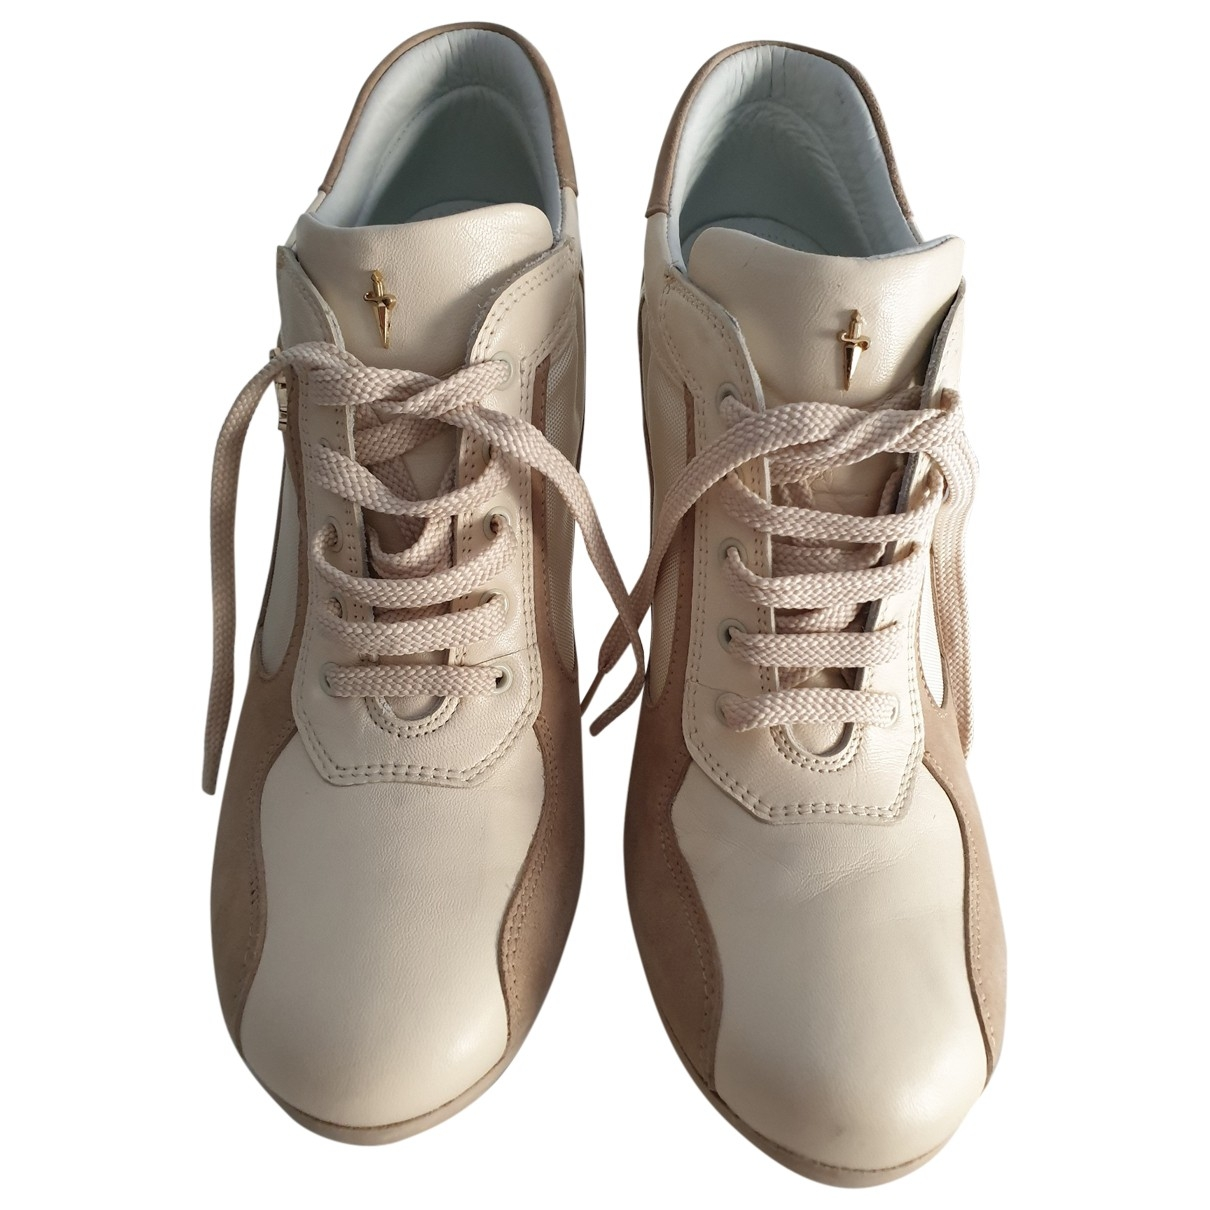 Cesare Paciotti \N Beige Leather Heels for Women 38 EU